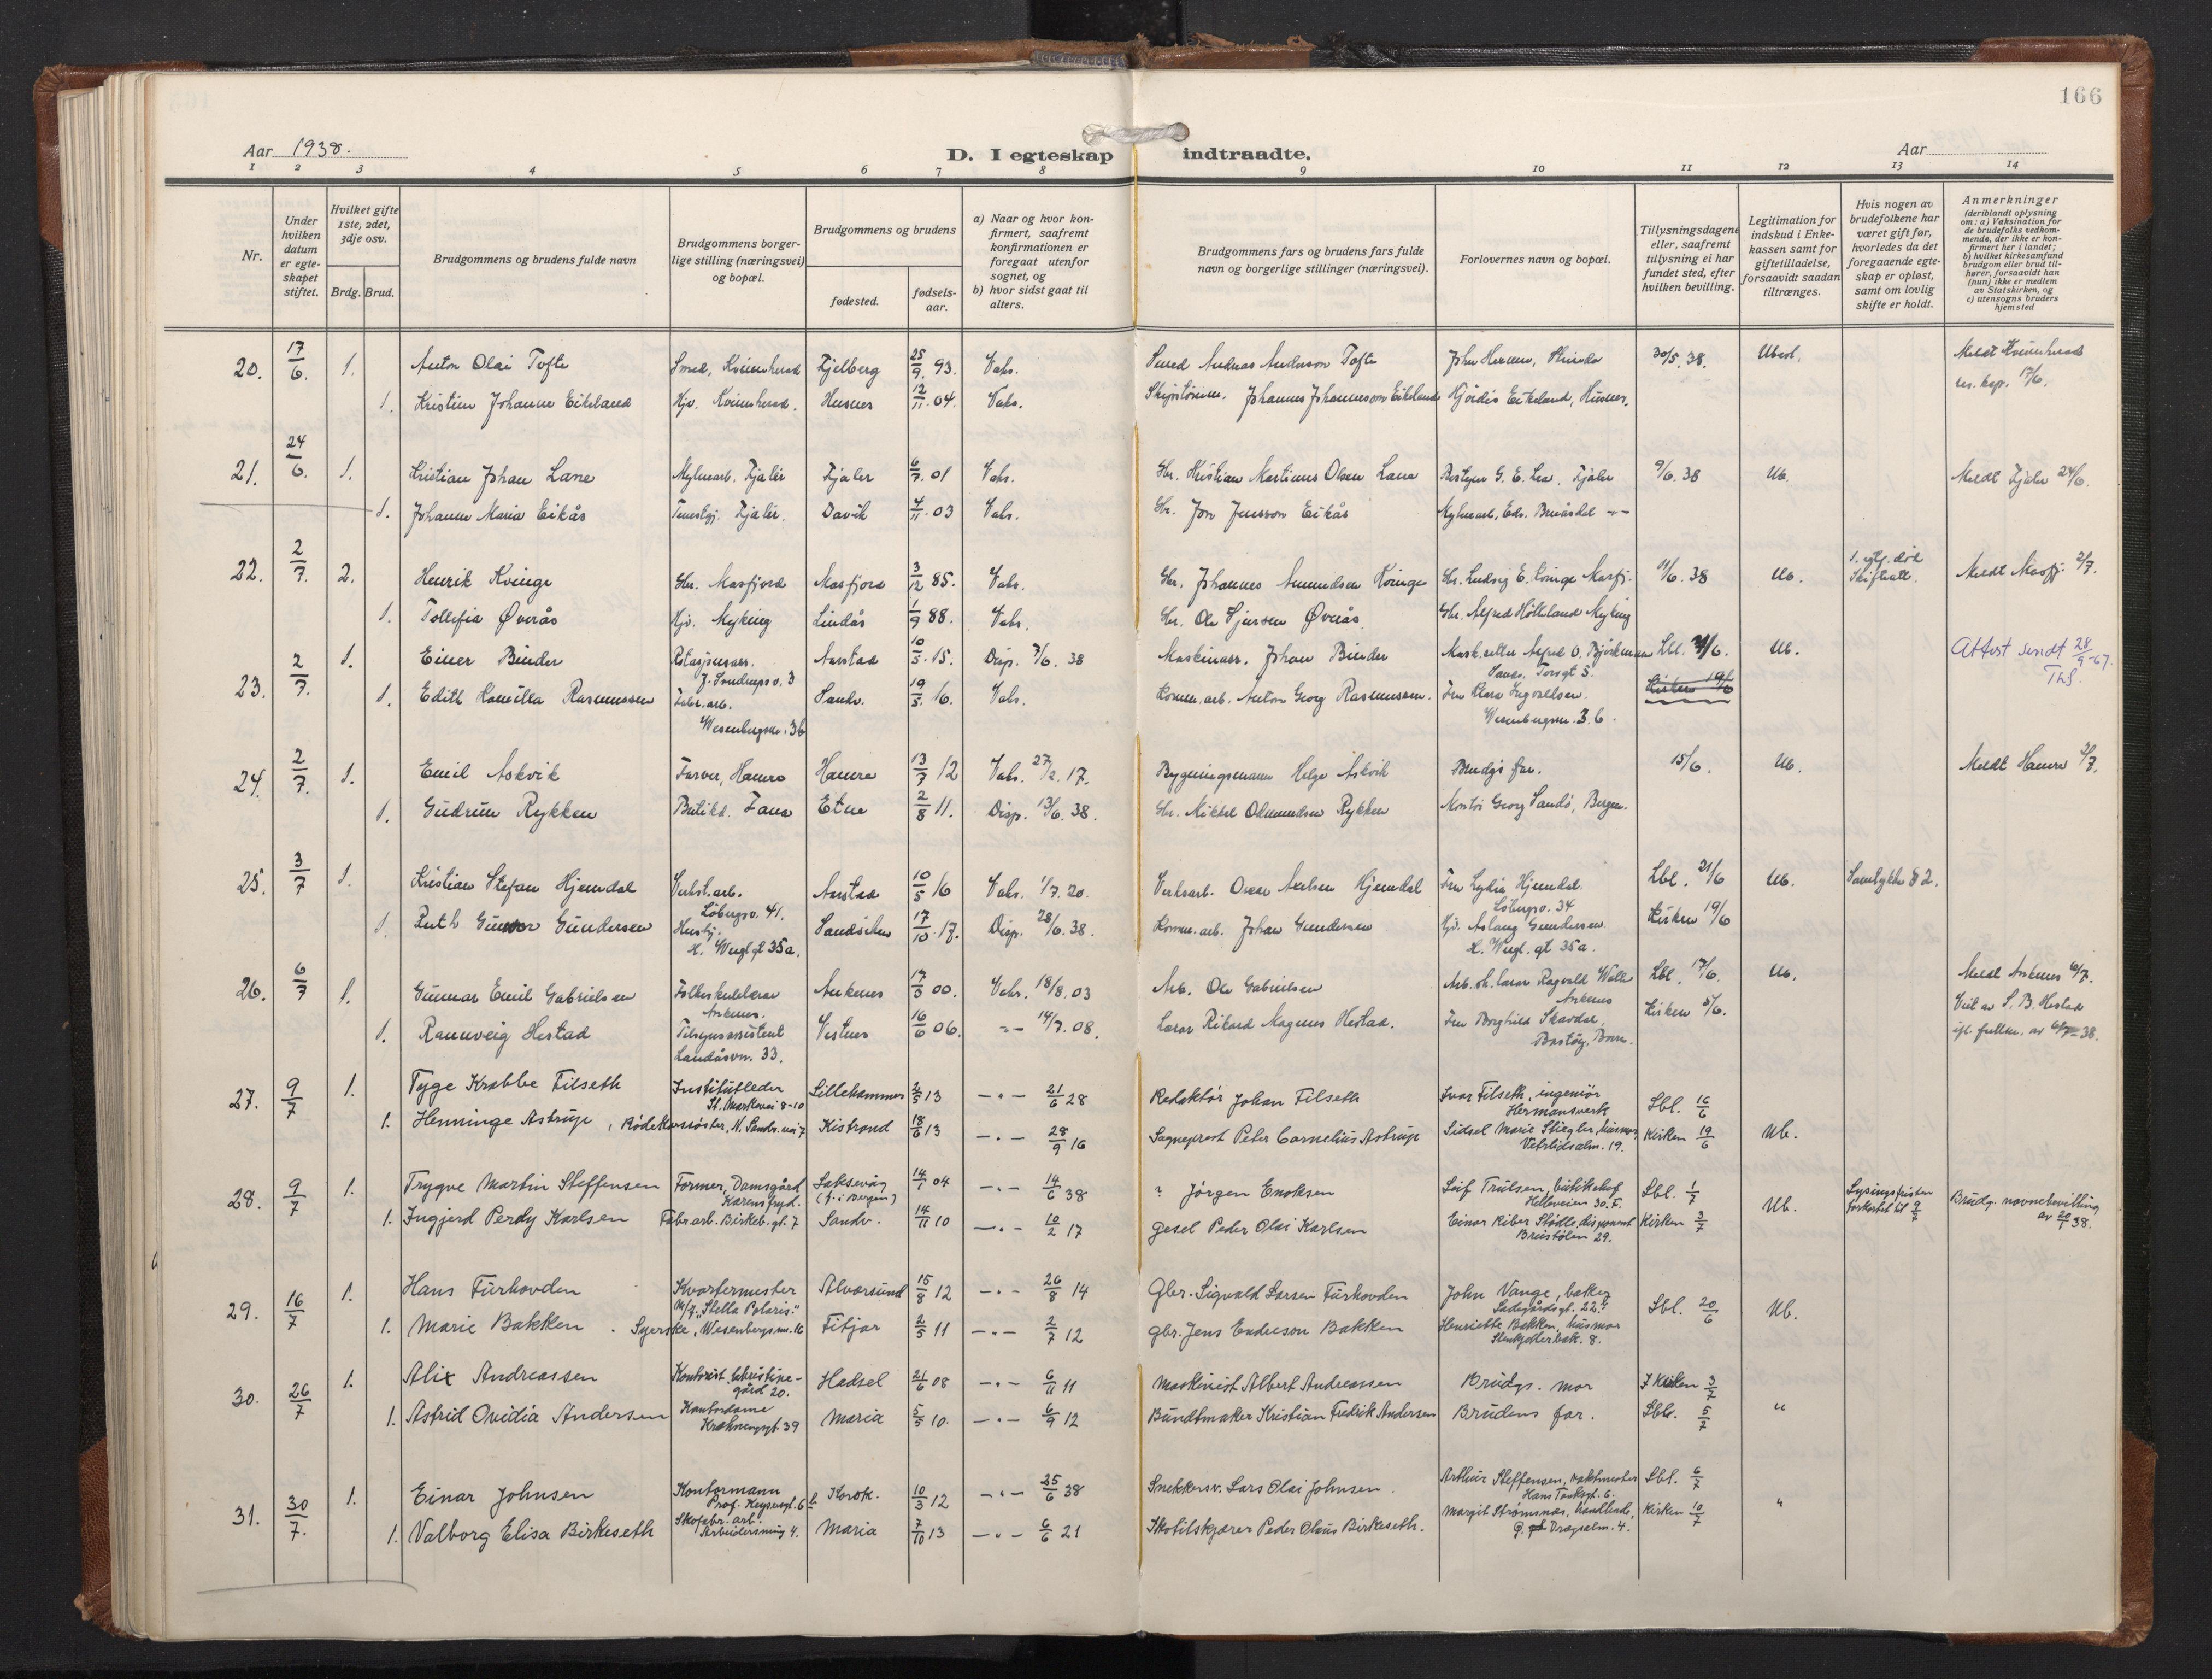 SAB, Mariakirken Sokneprestembete, H/Haa/L0016: Ministerialbok nr. C 4, 1927-1938, s. 165b-166a